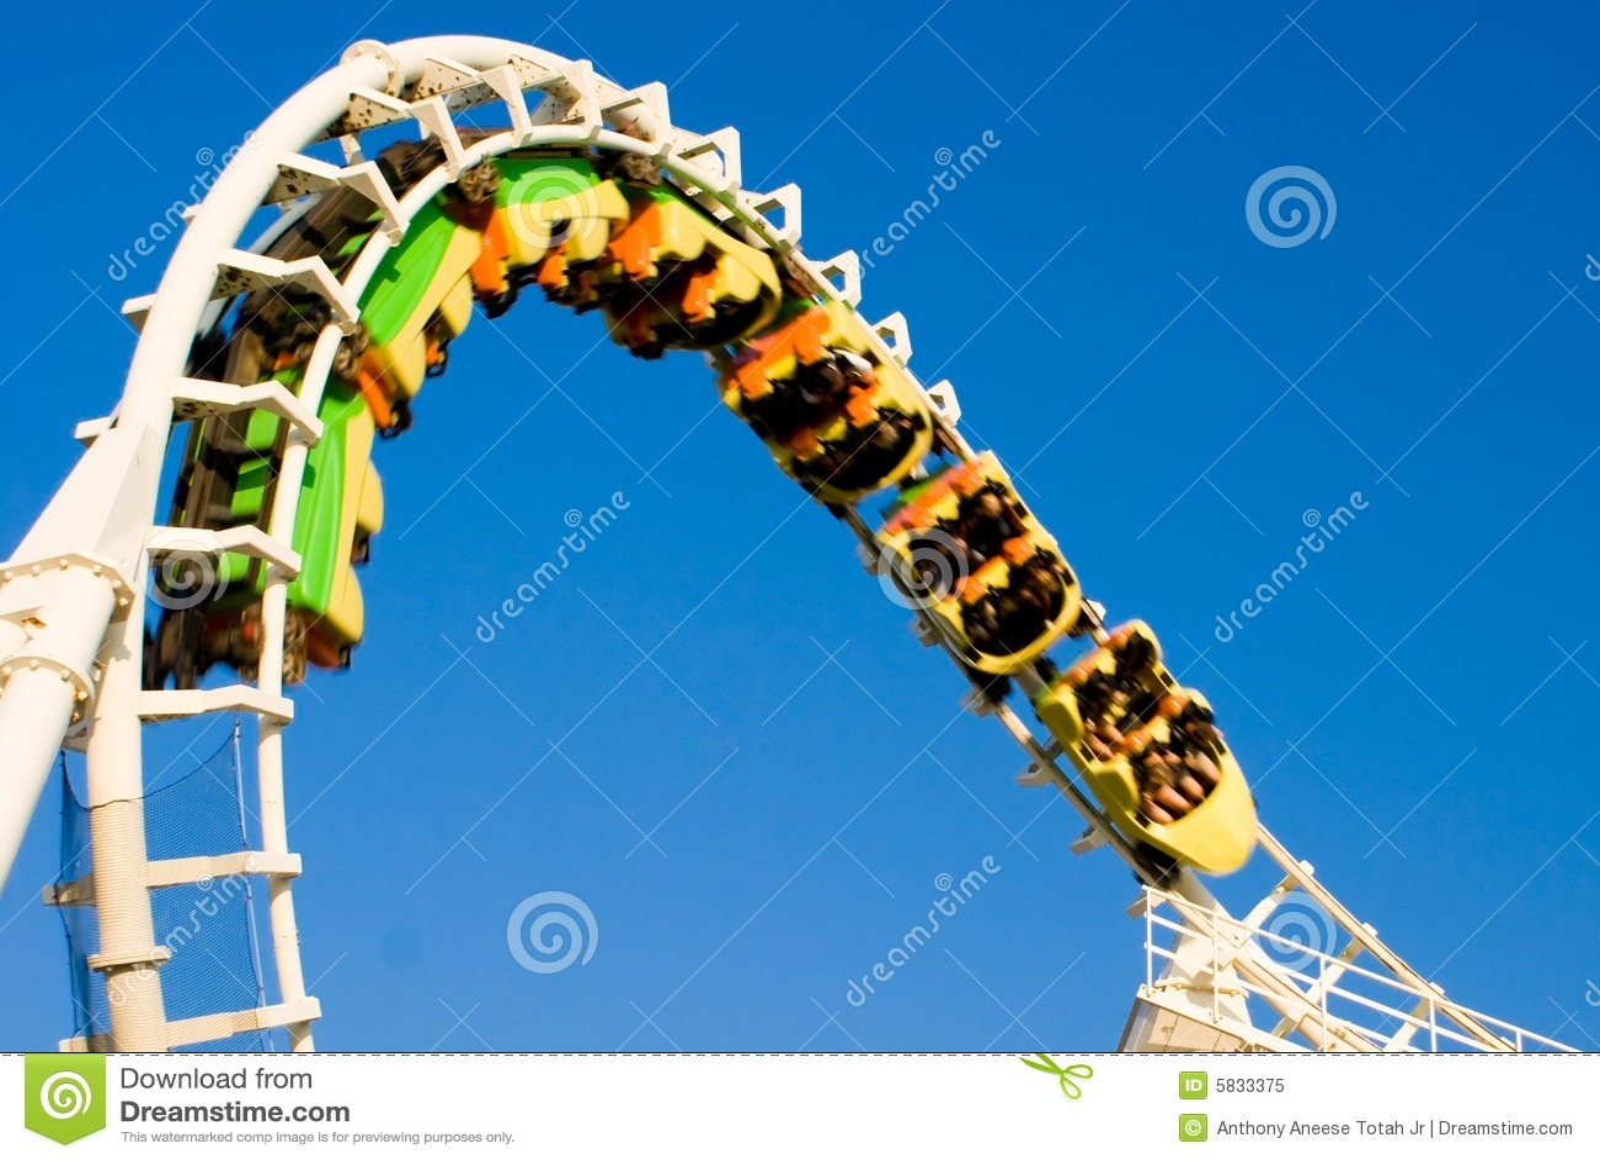 Roller coaster (invertido)